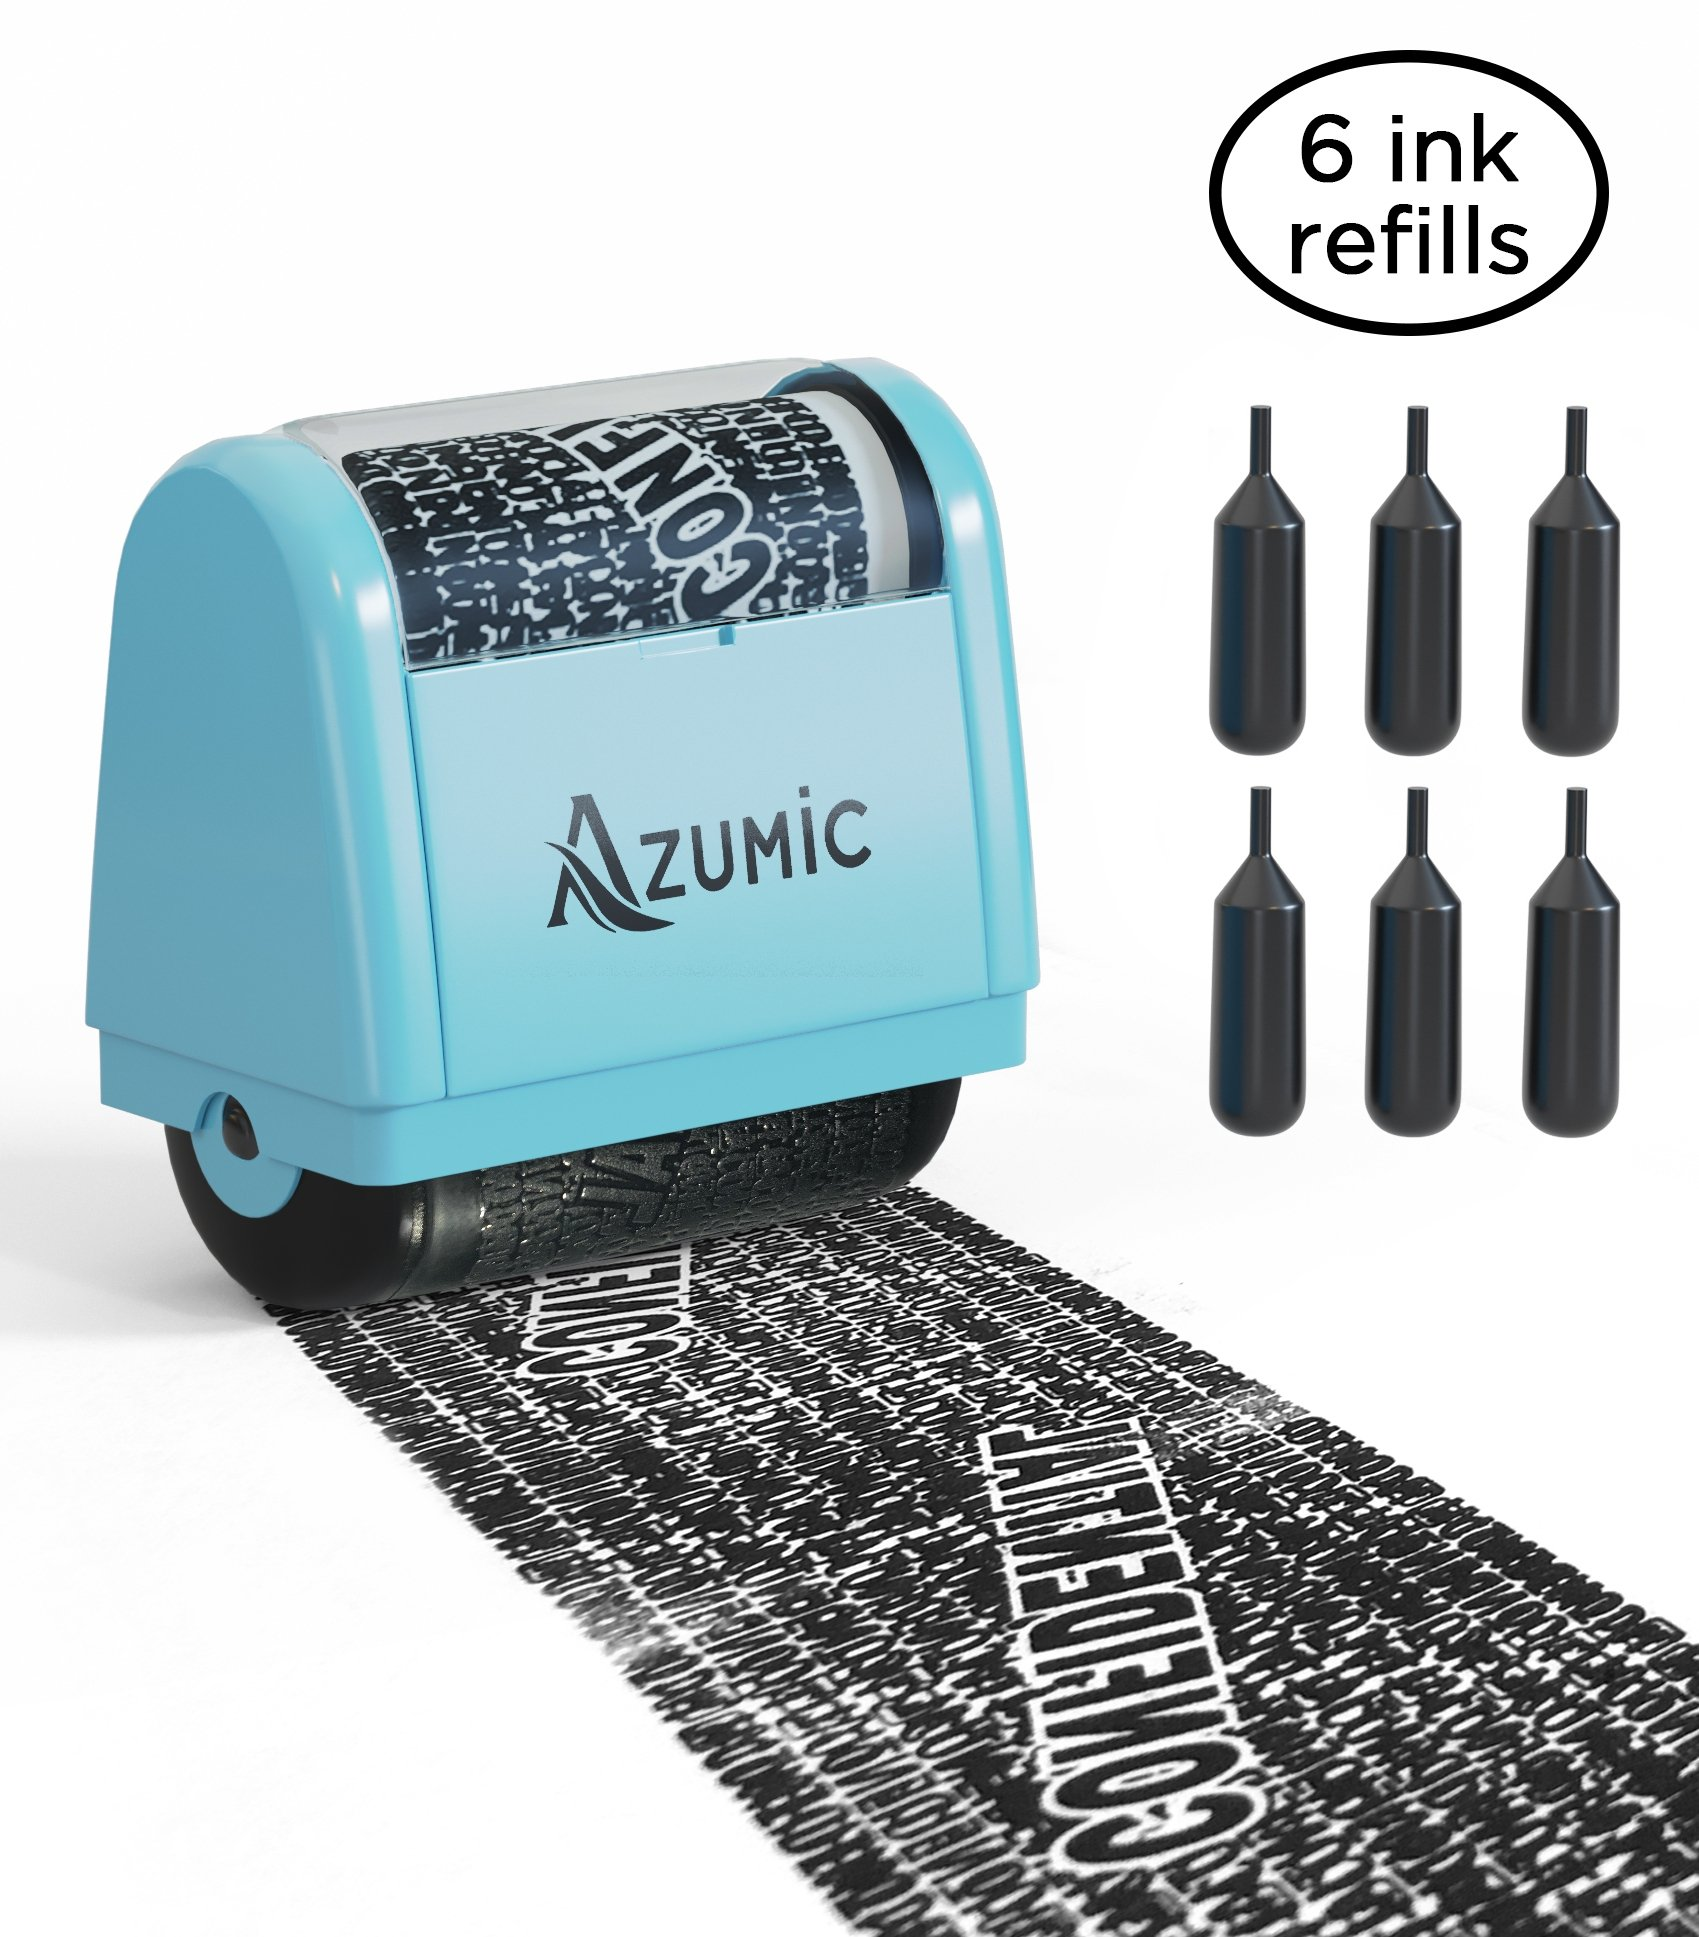 Azumic Confidential Address Blocker Anti Prevention Identity Theft Protection Roller Stamp 6 Pack Refills Light Blue